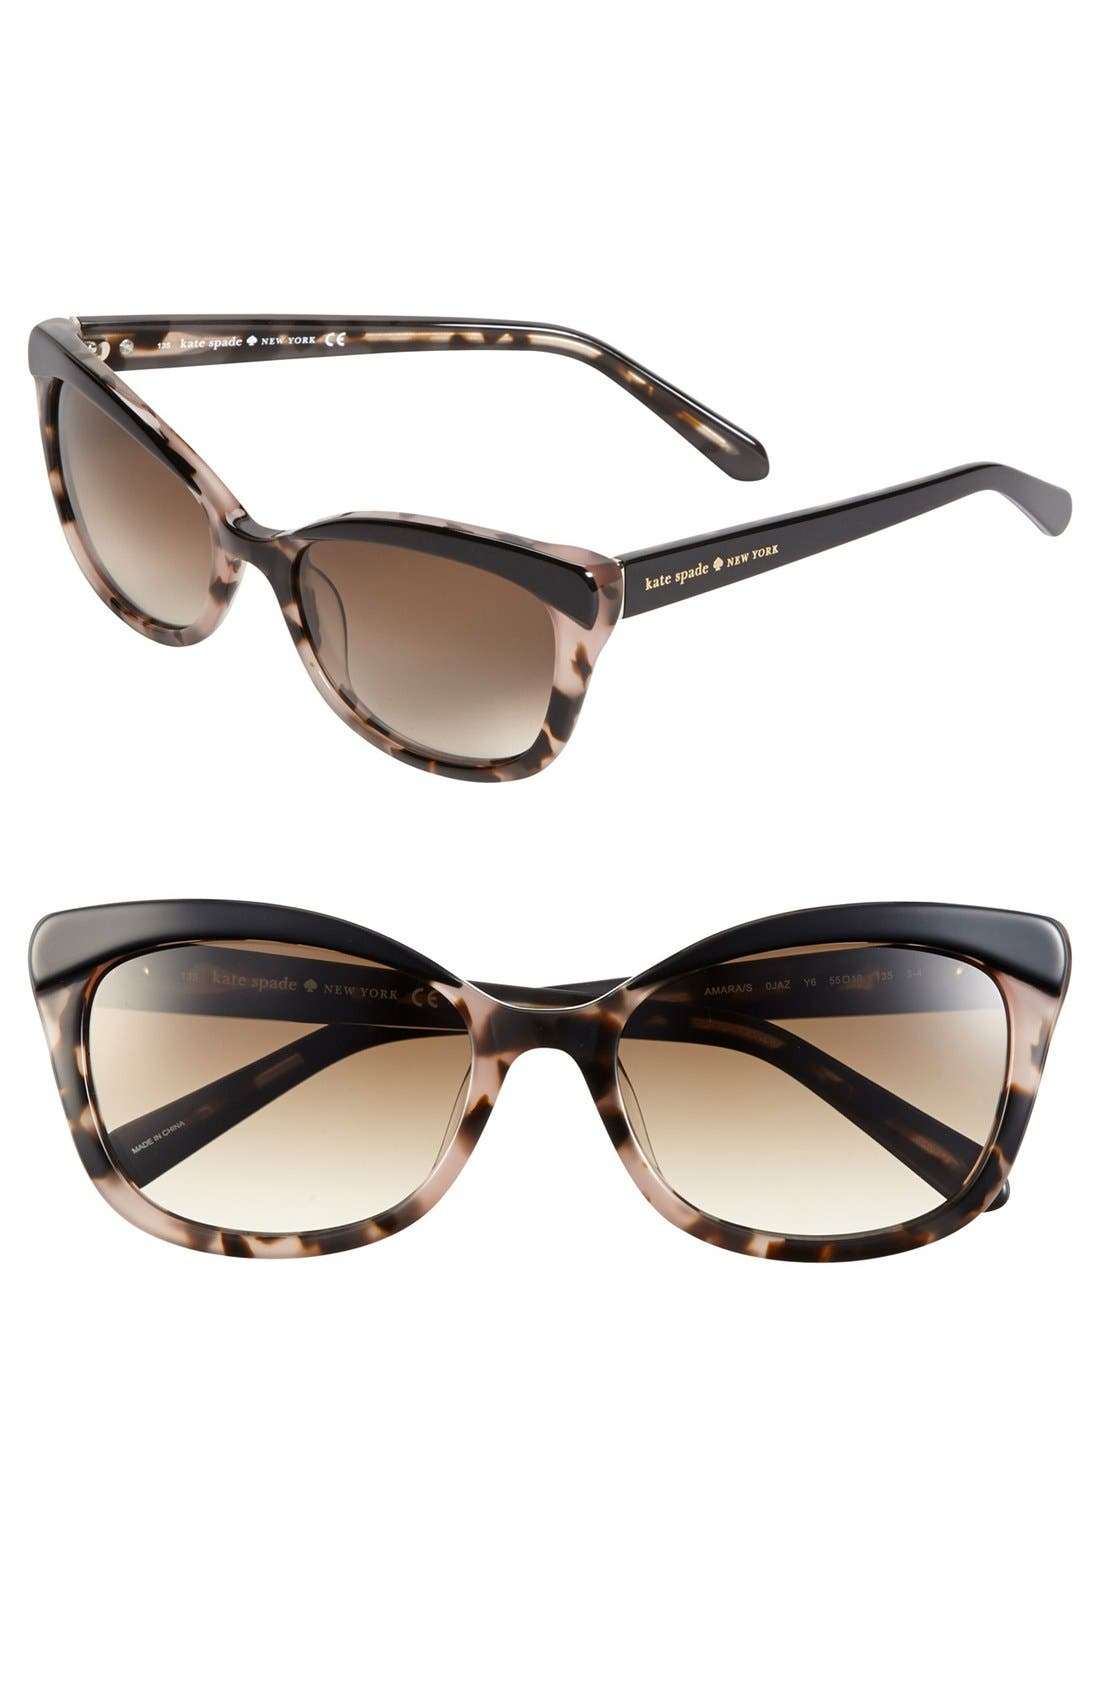 Alternate Image 1 Selected - kate spade new york 'amaras' 55mm sunglasses